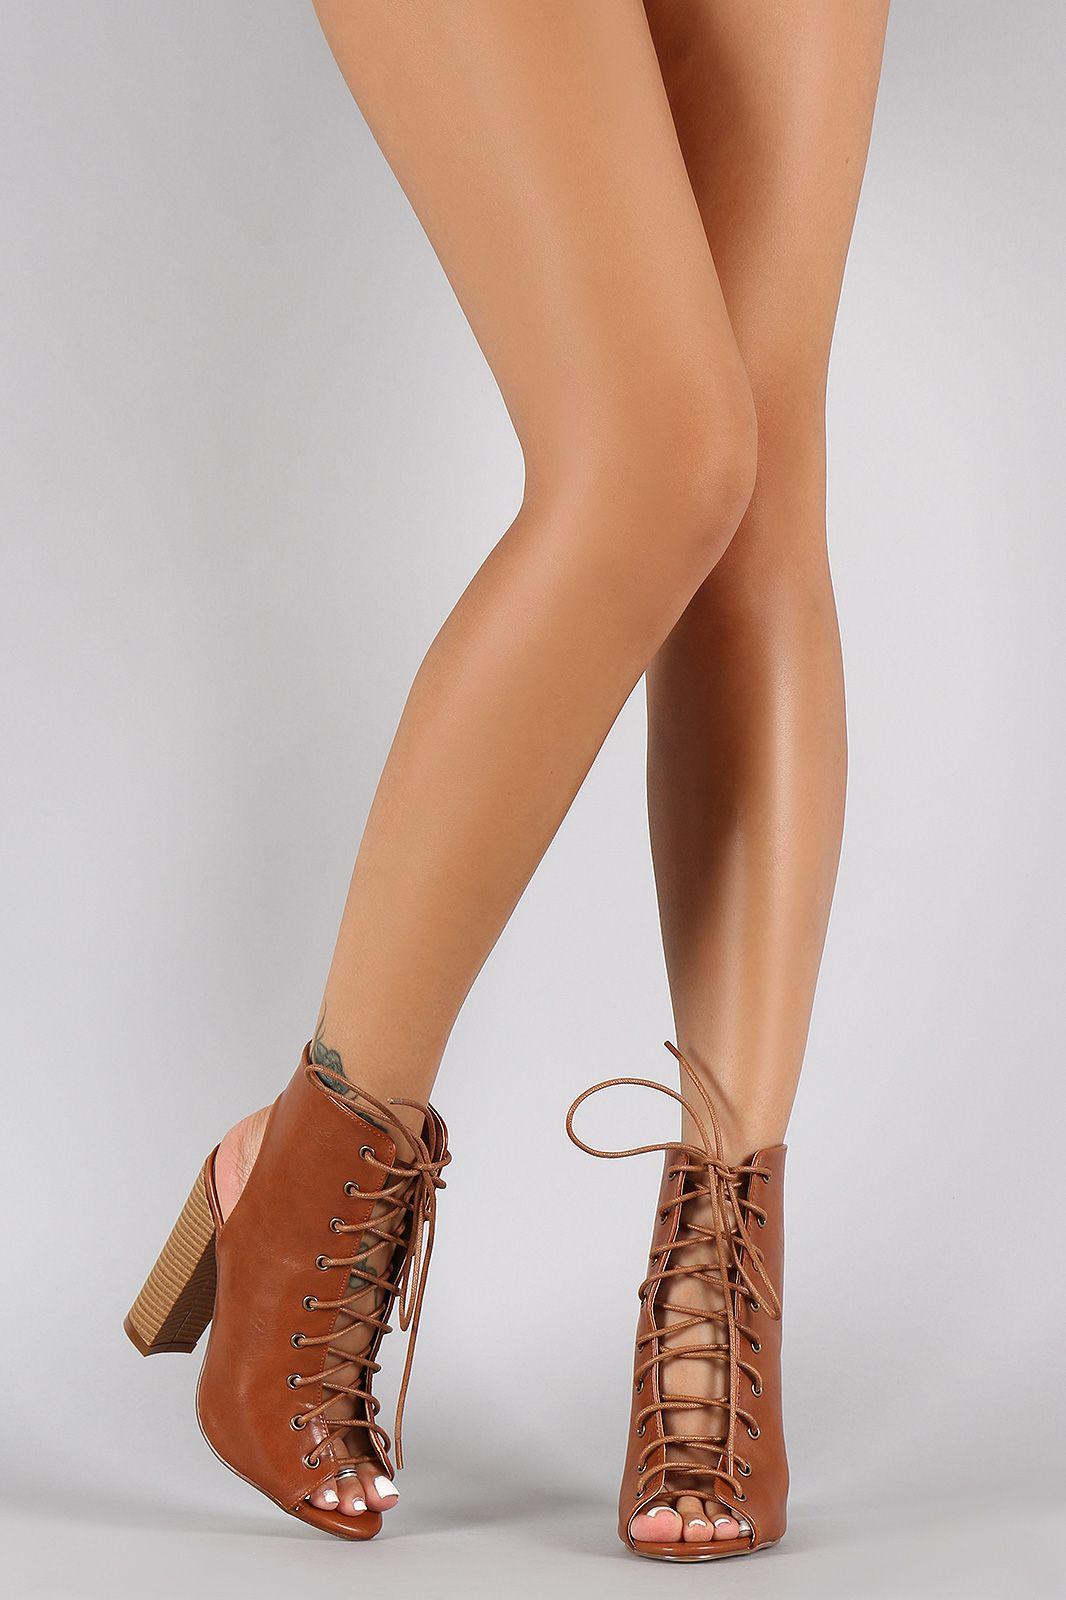 acc5fc4c81 Liliana Corset Lace Up Peep Toe Mule Chunky Heel | FALL/WINTER SHOES ...